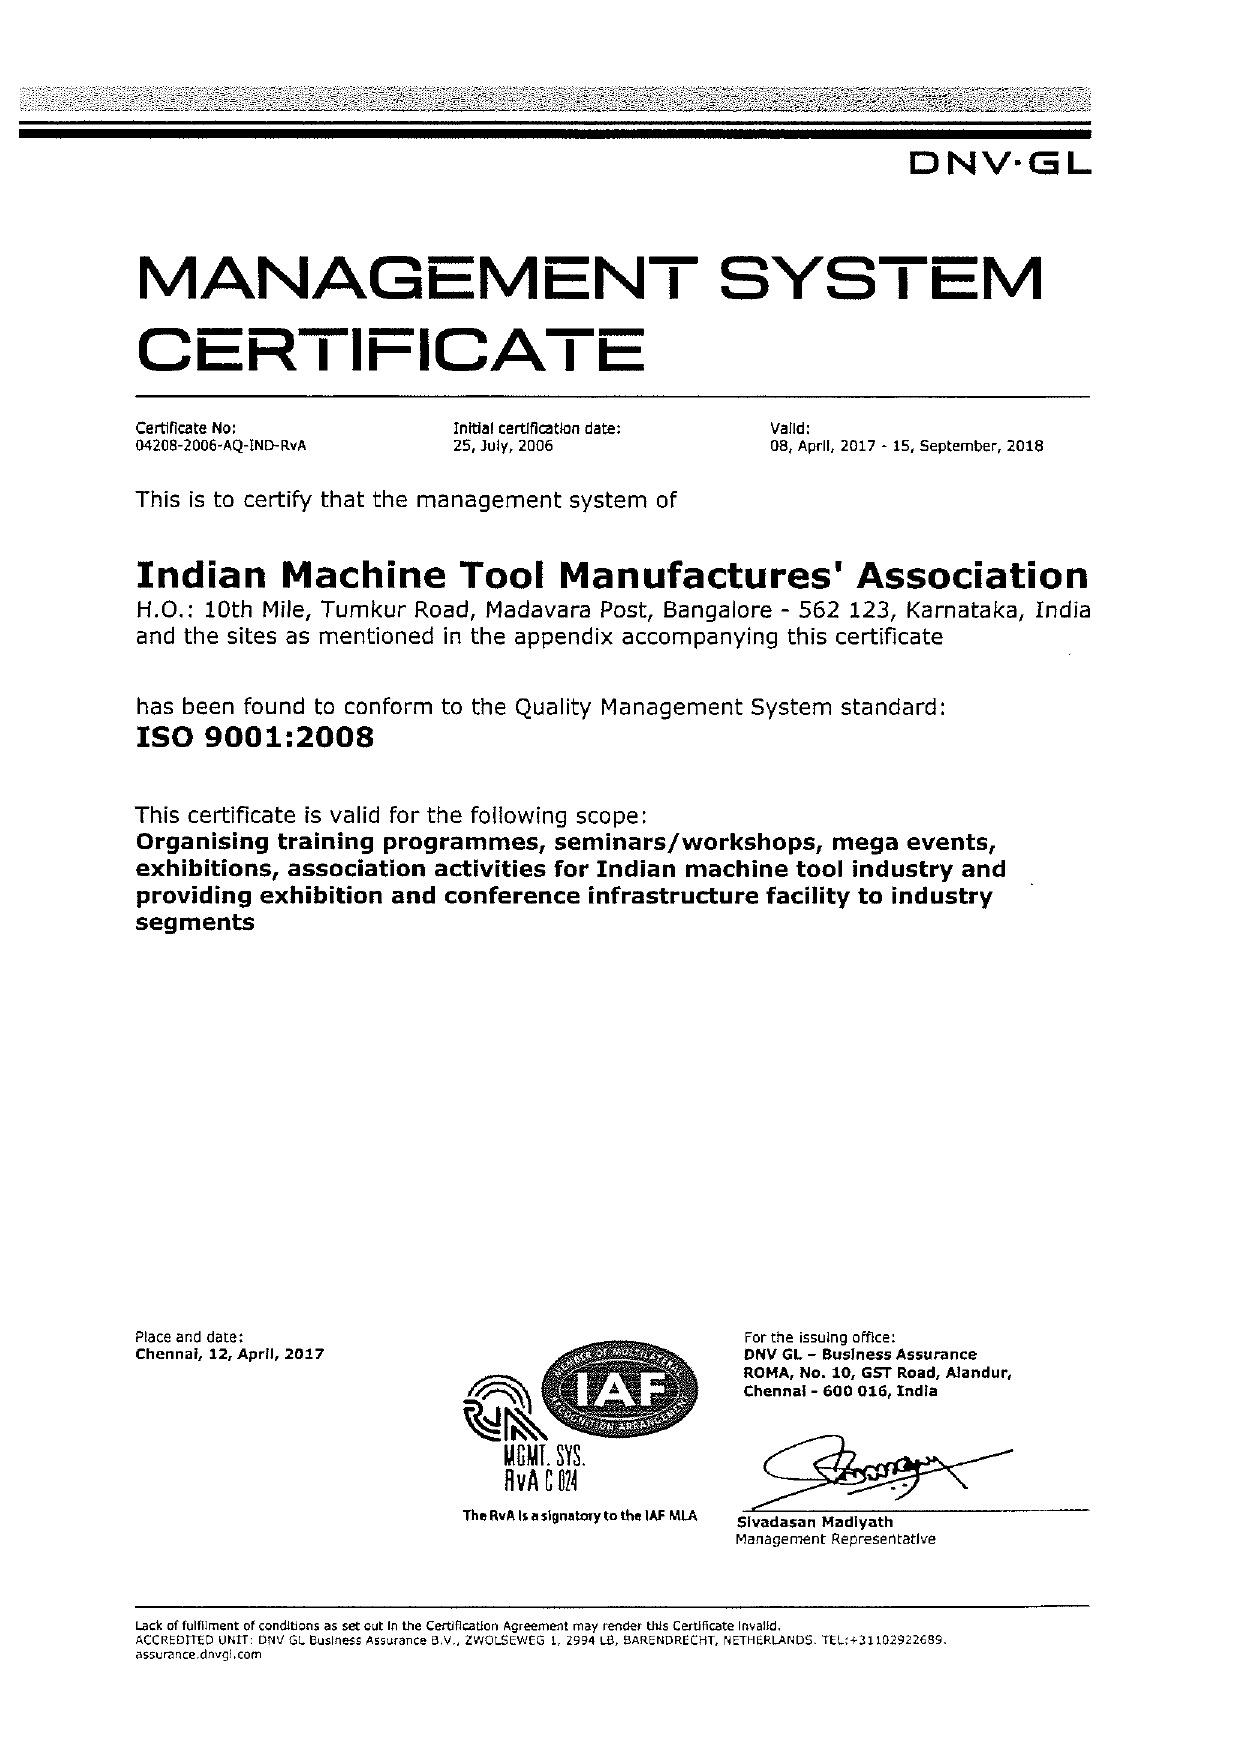 Certifications Imtma